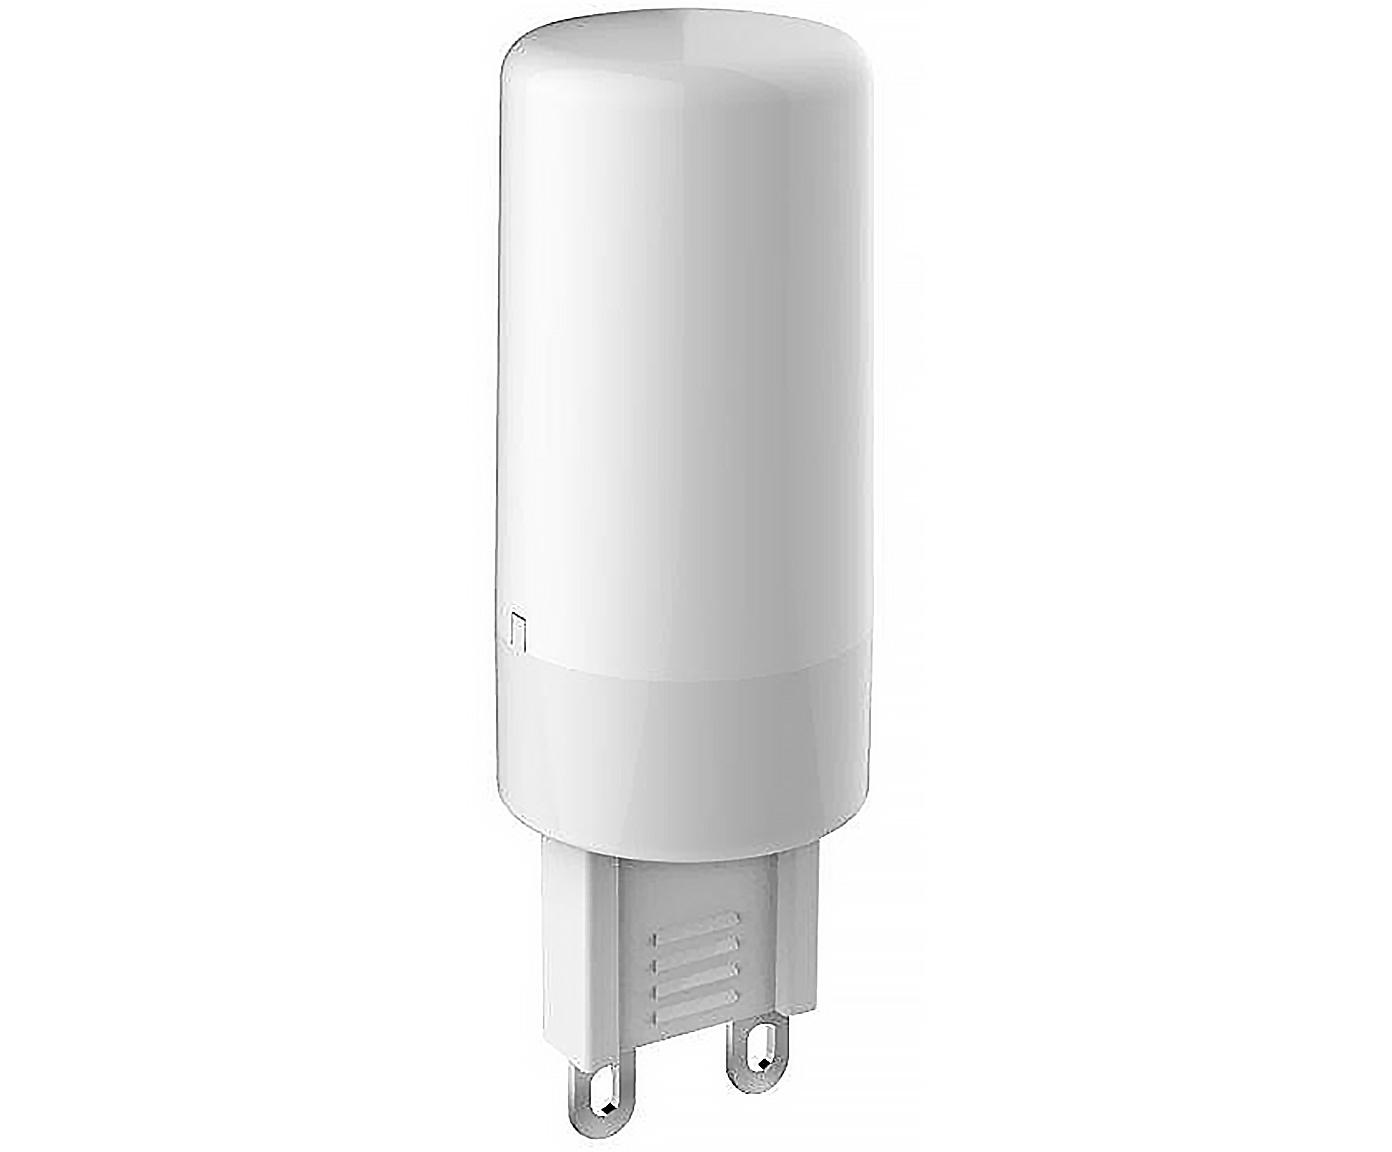 LED lamp Gabriel(G9 / 3W) 5 stuks, Lampenkap: kunststof, Fitting: aluminium, Transparant, Ø 2 x H 6 cm